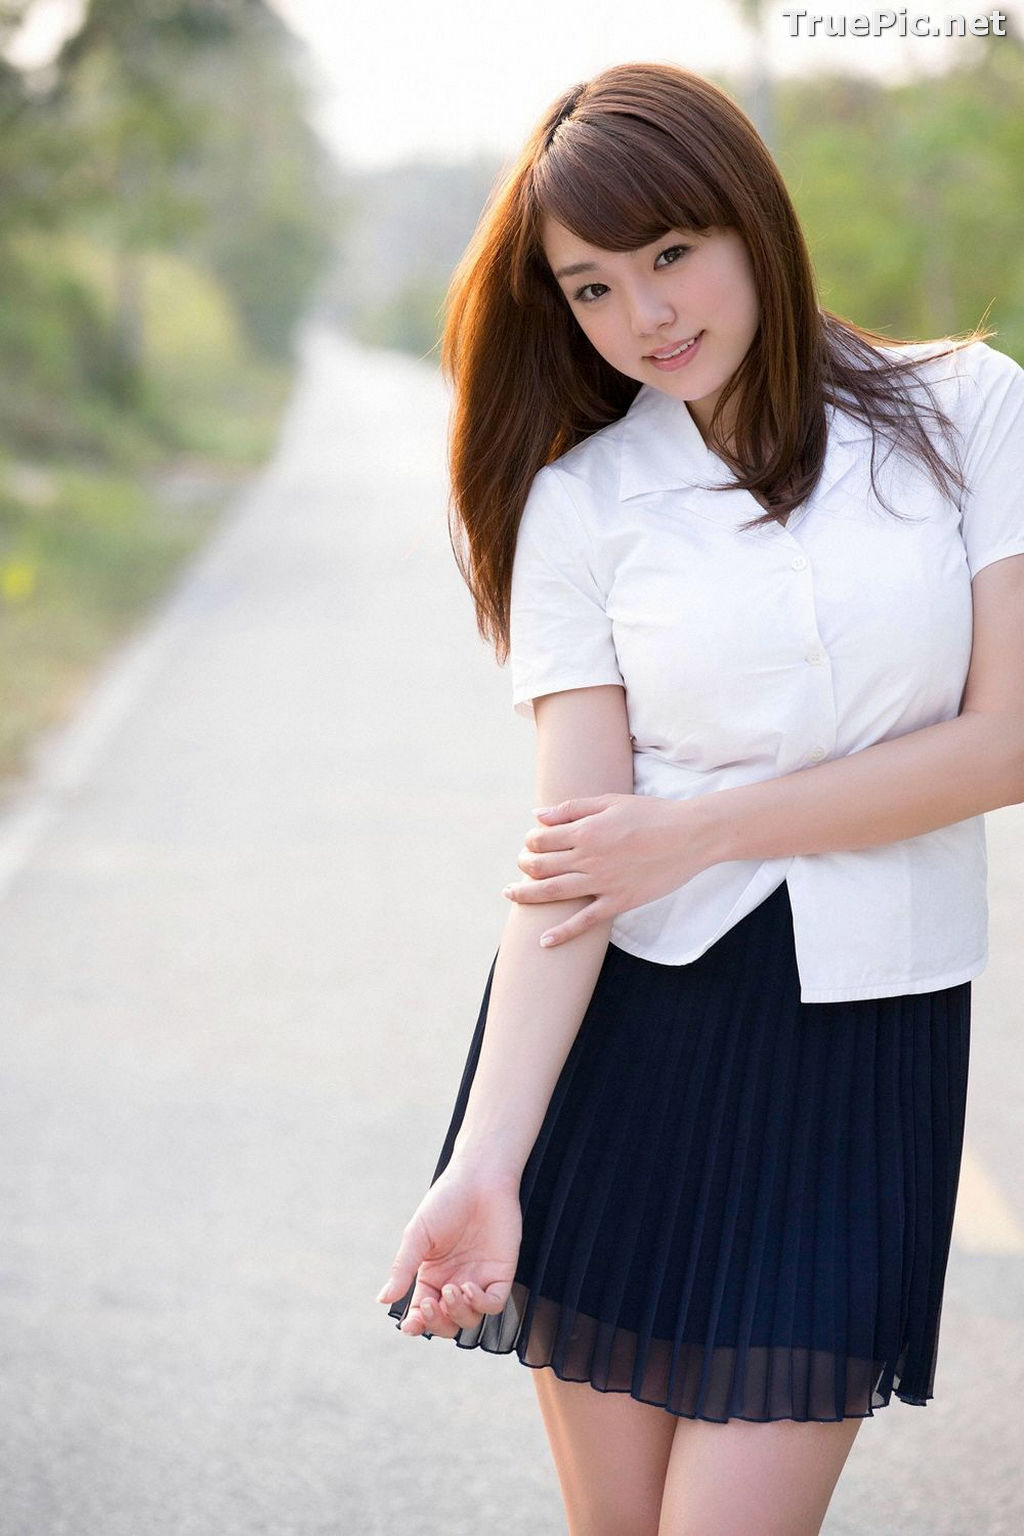 Image [YS Web] Vol.560 - Japanese Gravure Idol and Singer - Ai Shinozaki - TruePic.net - Picture-6